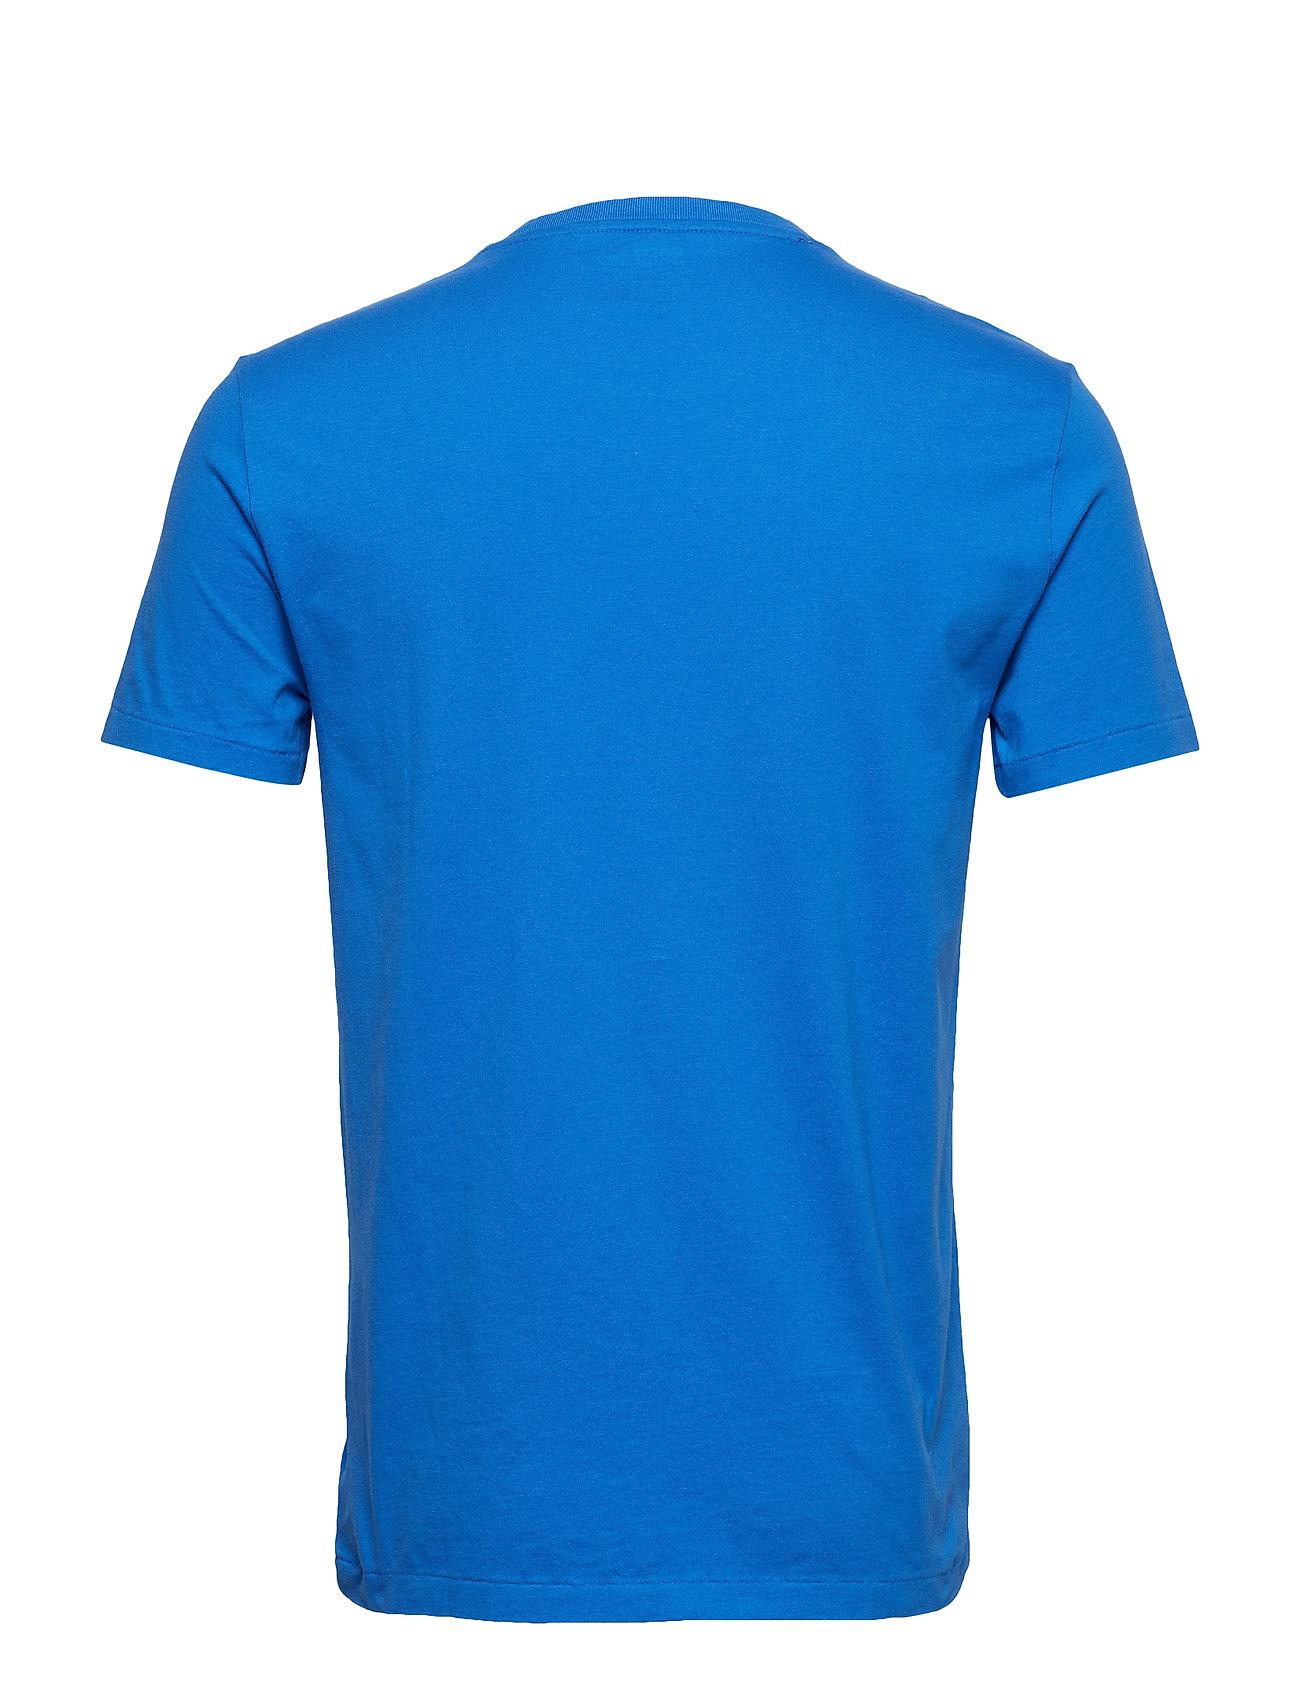 Pocket shirtcolby Ralph BluePolo Slim Lauren T Fit Custom 8kw0nPO